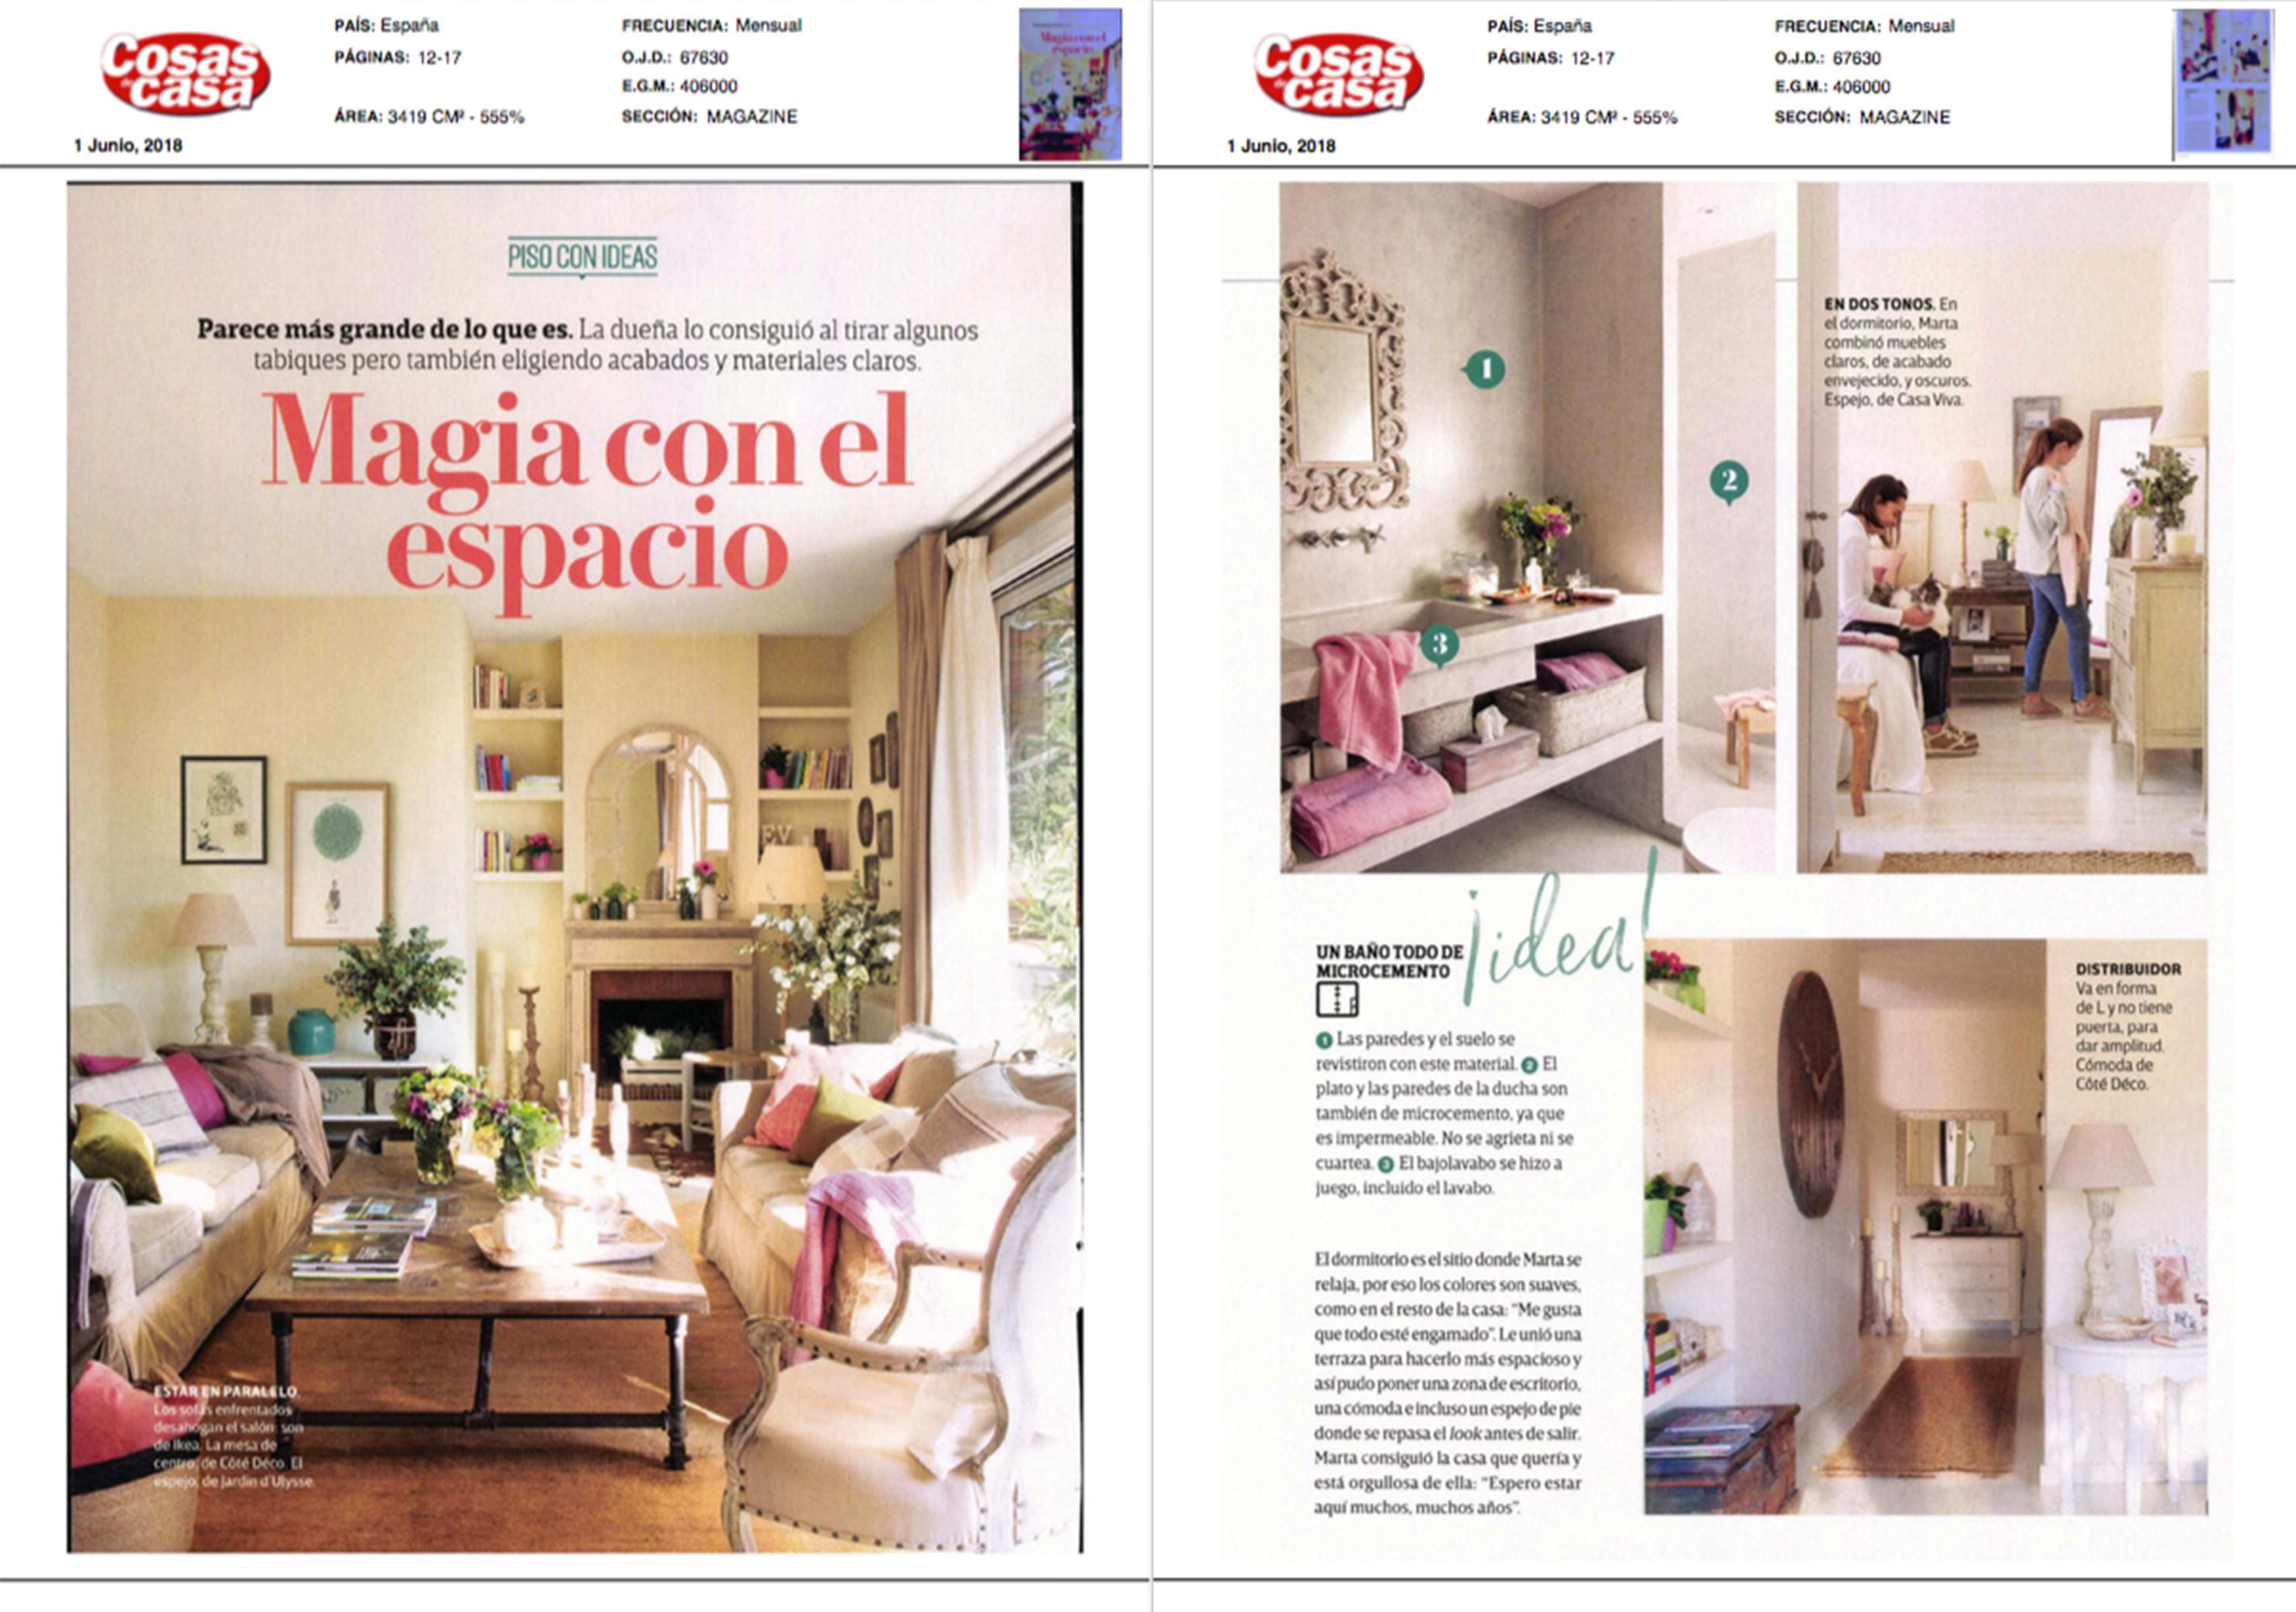 180601_Cosas de casa (BSB)